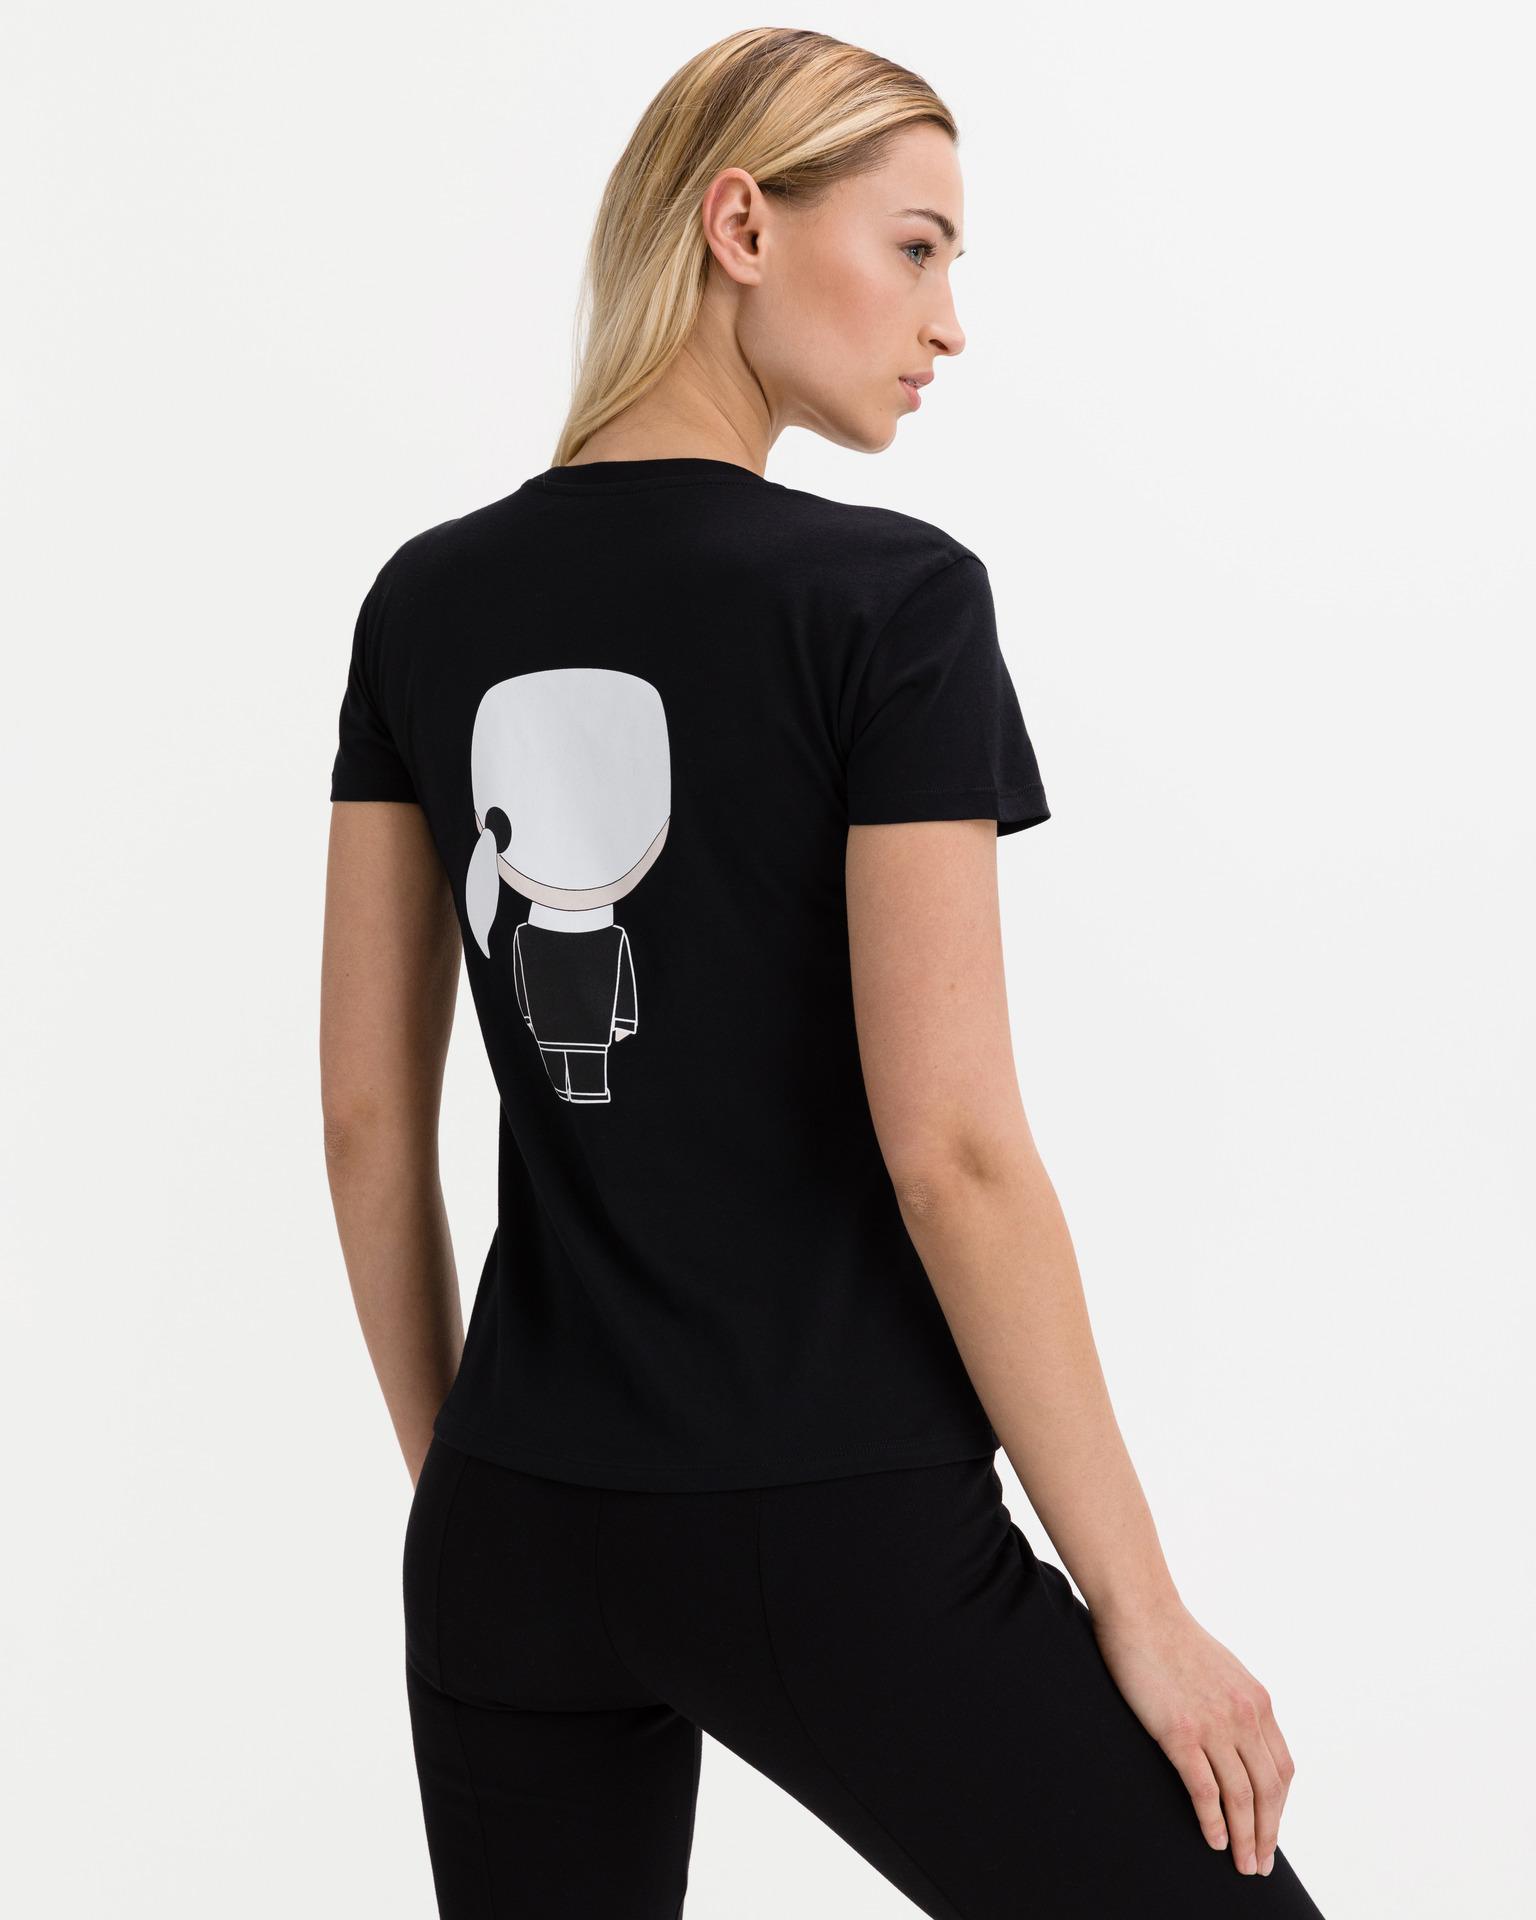 t-shirt ikonik karl KARL LAGERFELD | T-shirt | 210W1721,21999